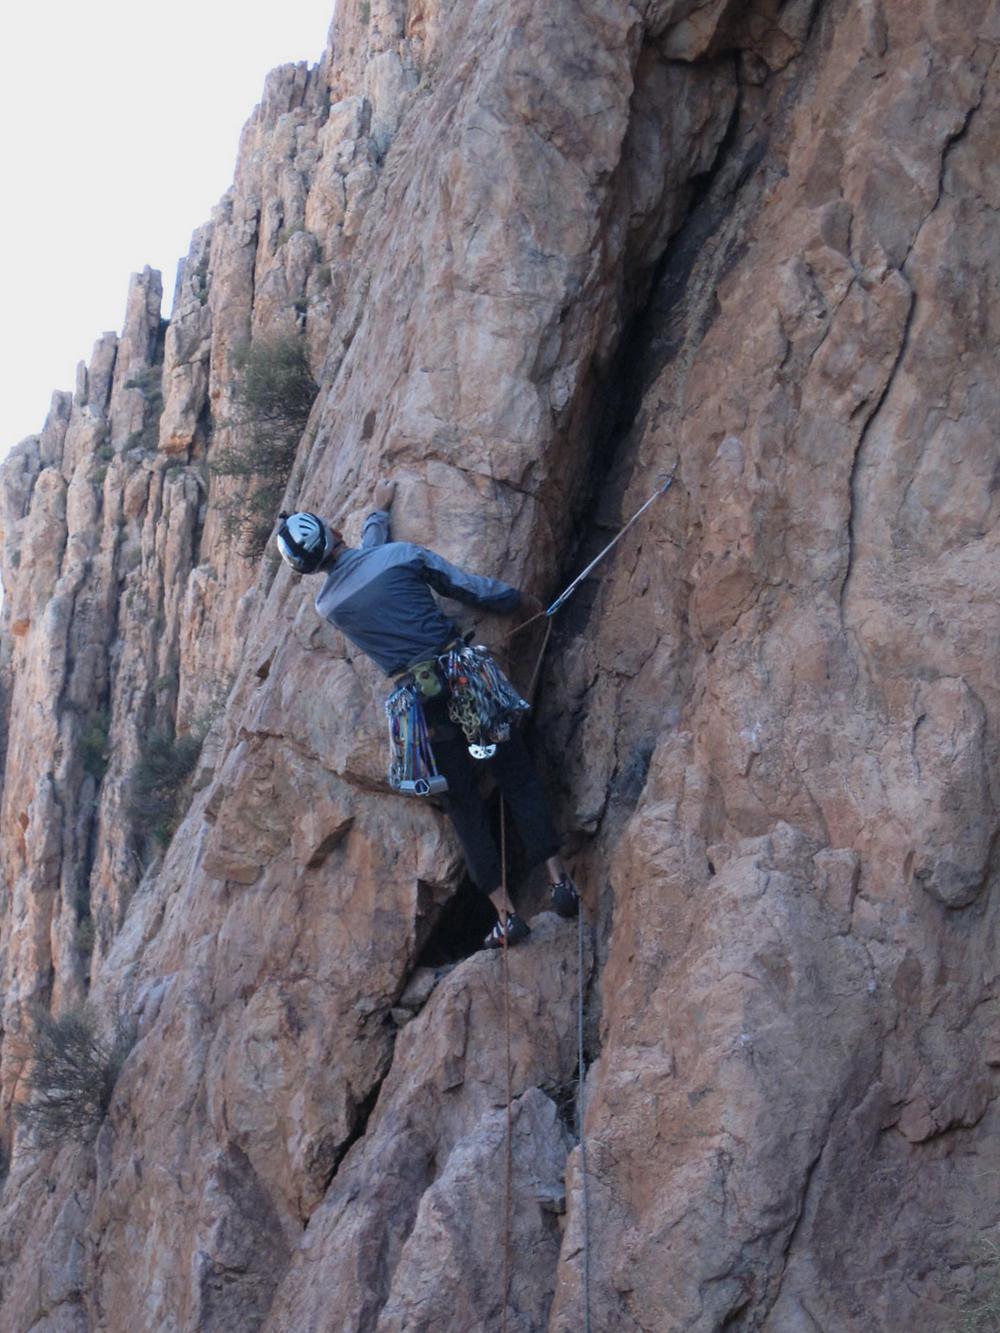 Climber on loose block